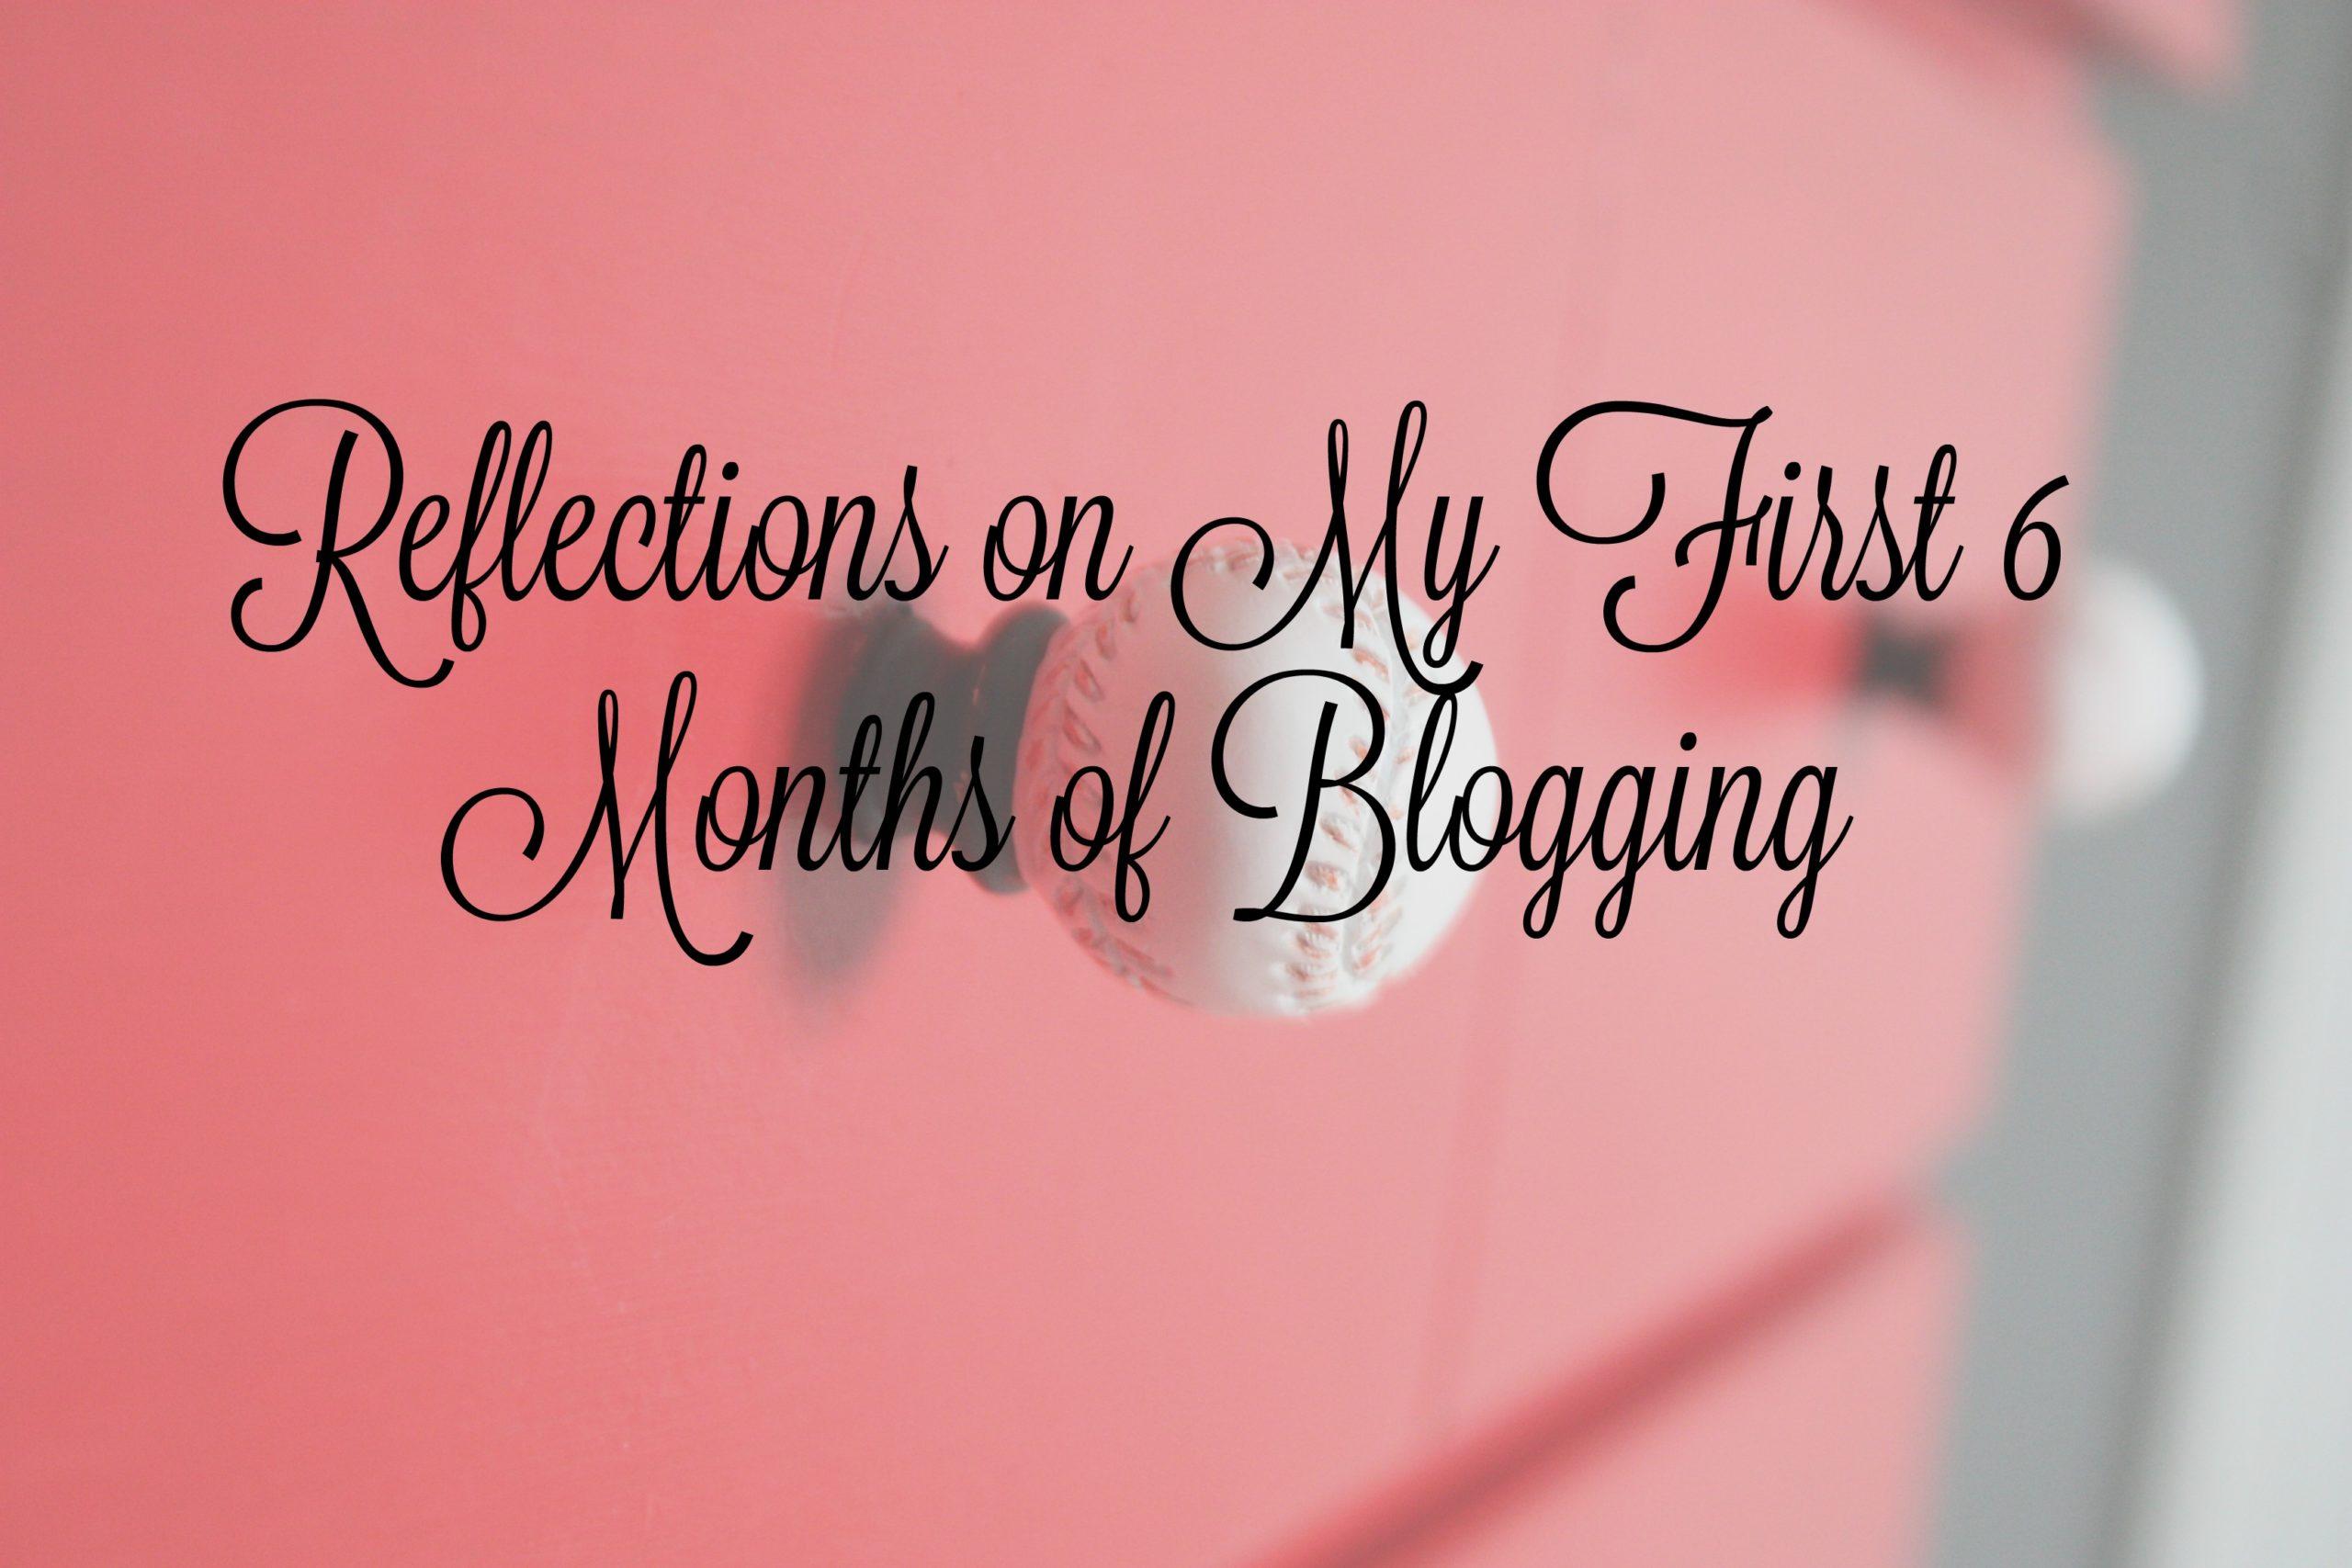 First 6 Months of Blogging